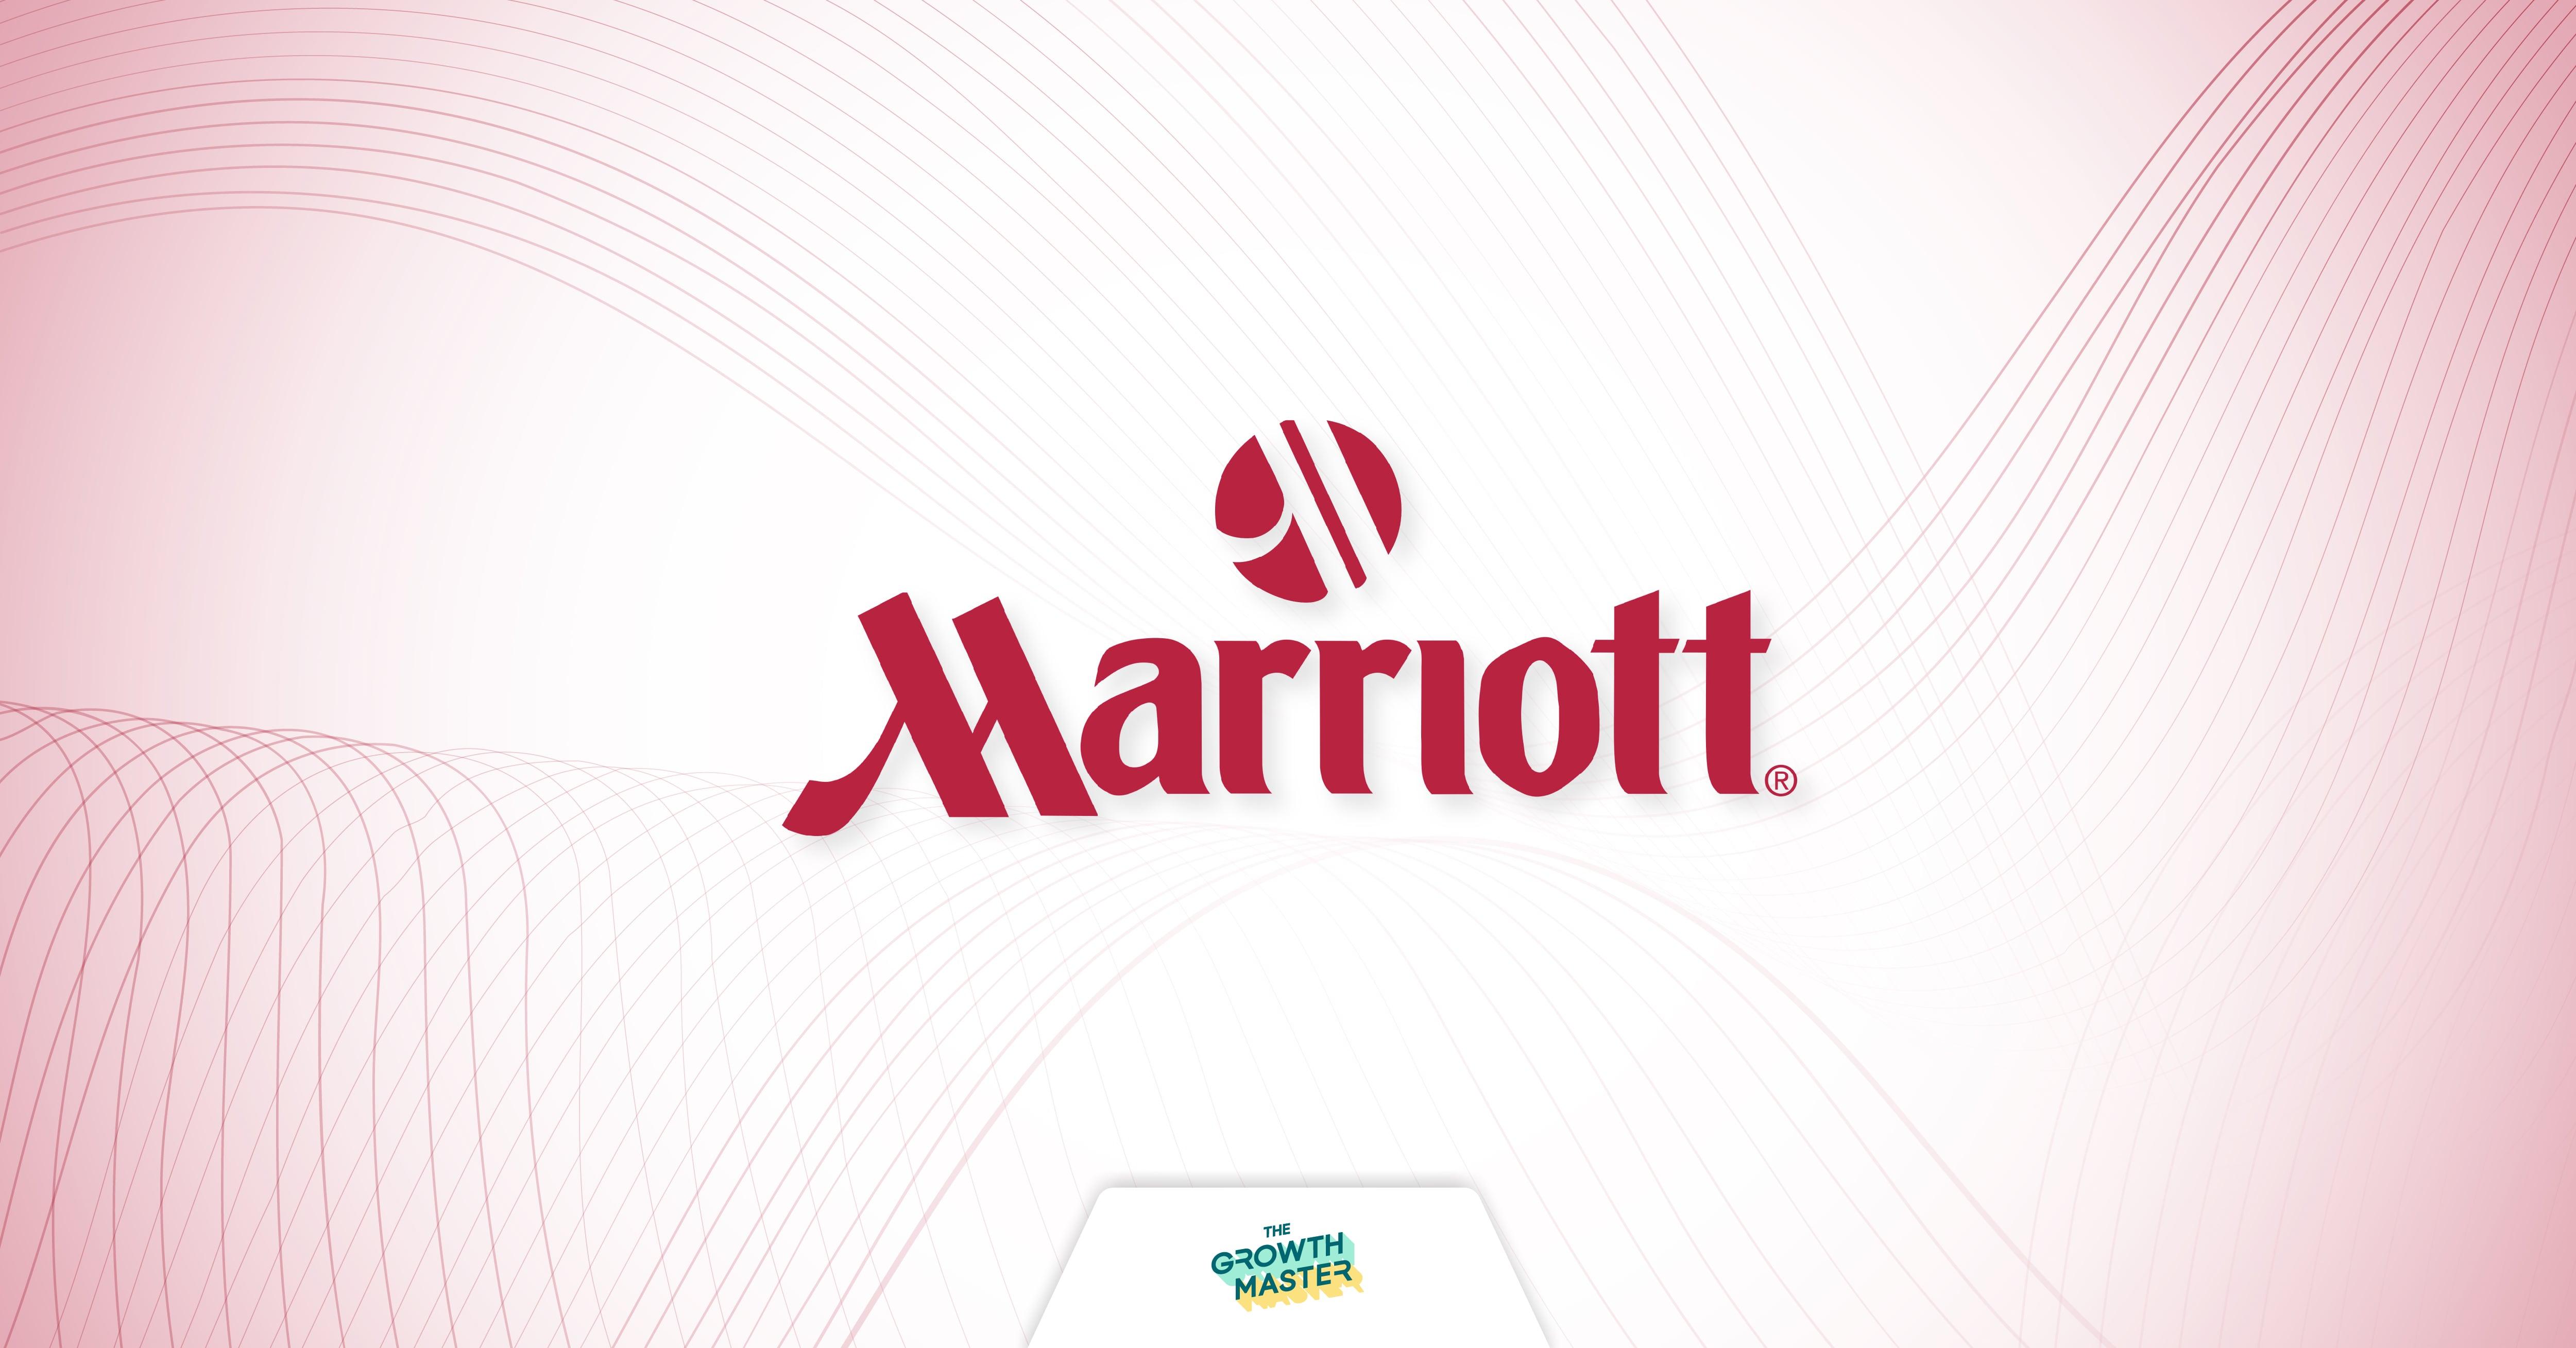 CASE STUDY : ย้อนรอยกลยุทธ์การเติบโตของ Marriott และวิธีดึงดูดลูกค้าให้กลับมาในยุคที่ Covid-19 บุกโลก